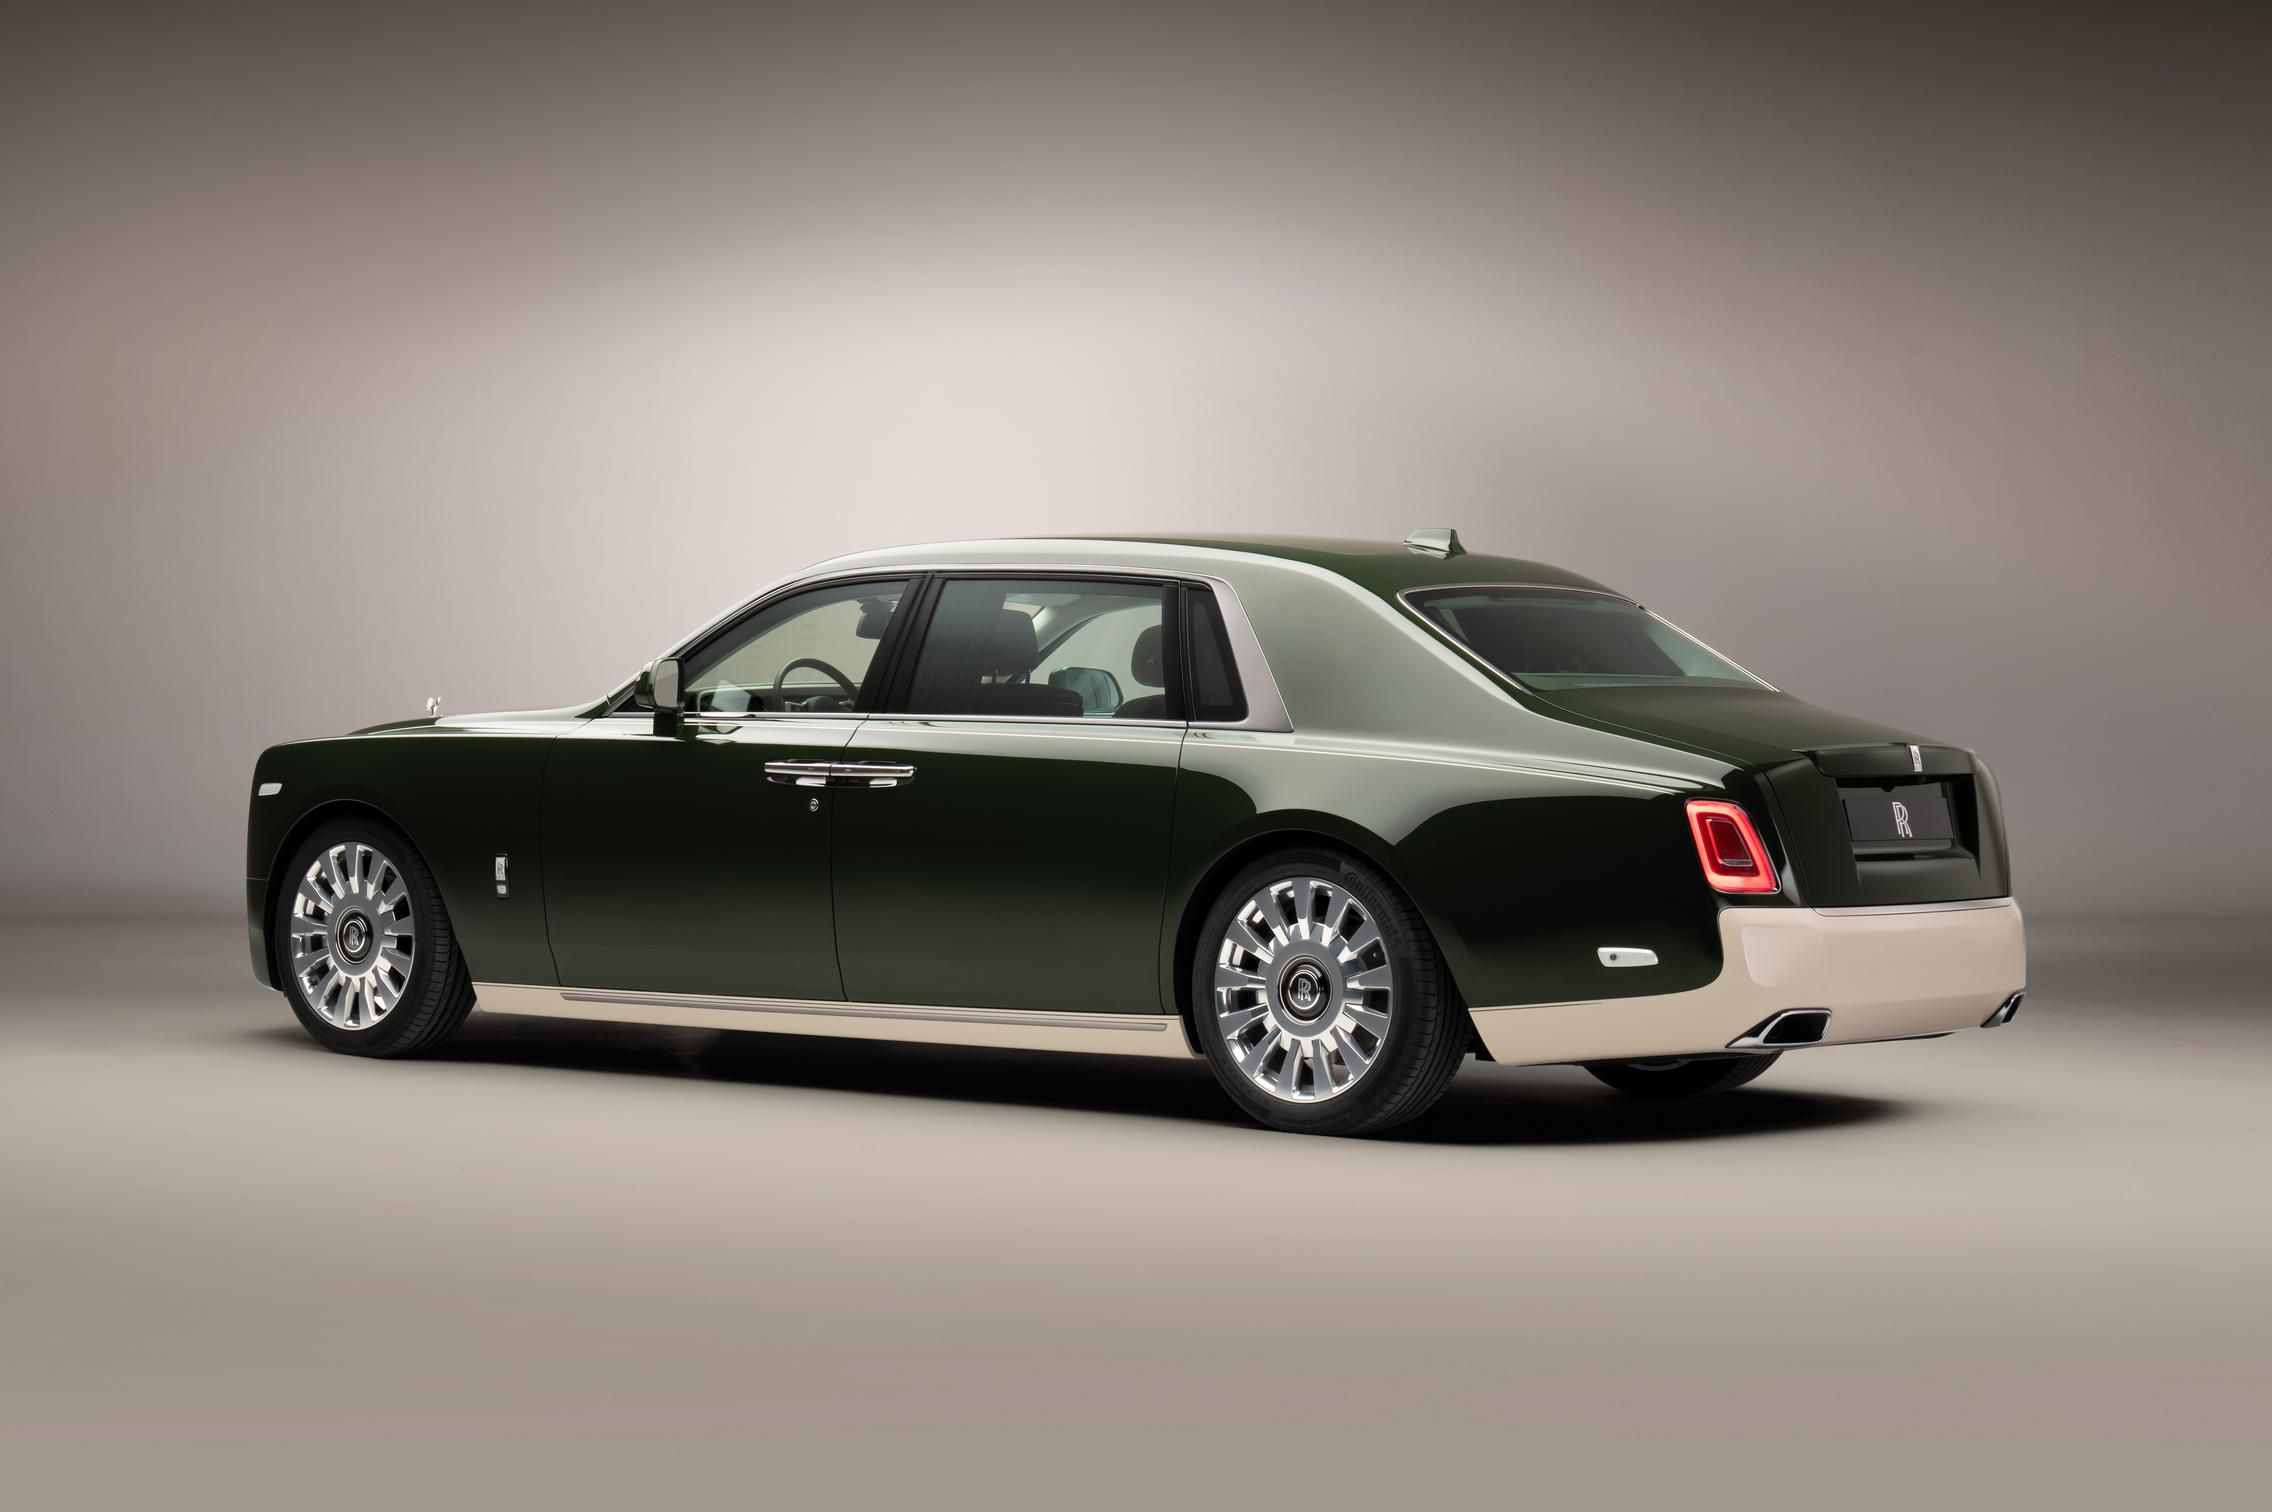 Hermes Rolls-Royce Phantom rear